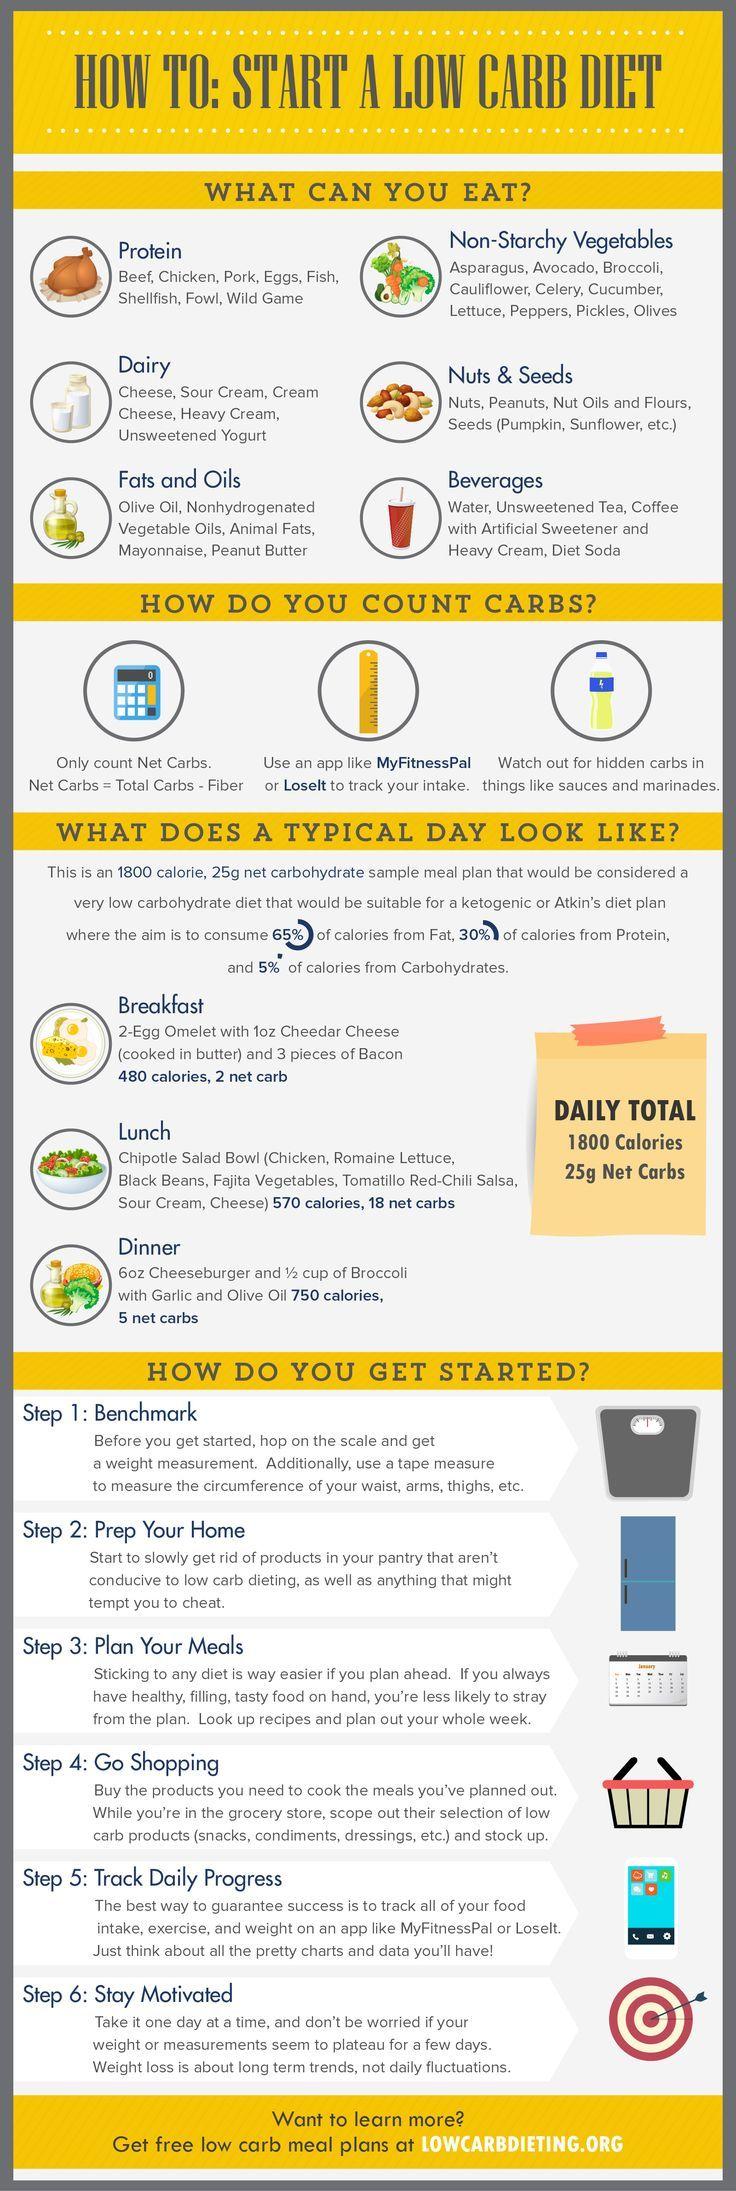 Use garcinia cambogia weight loss